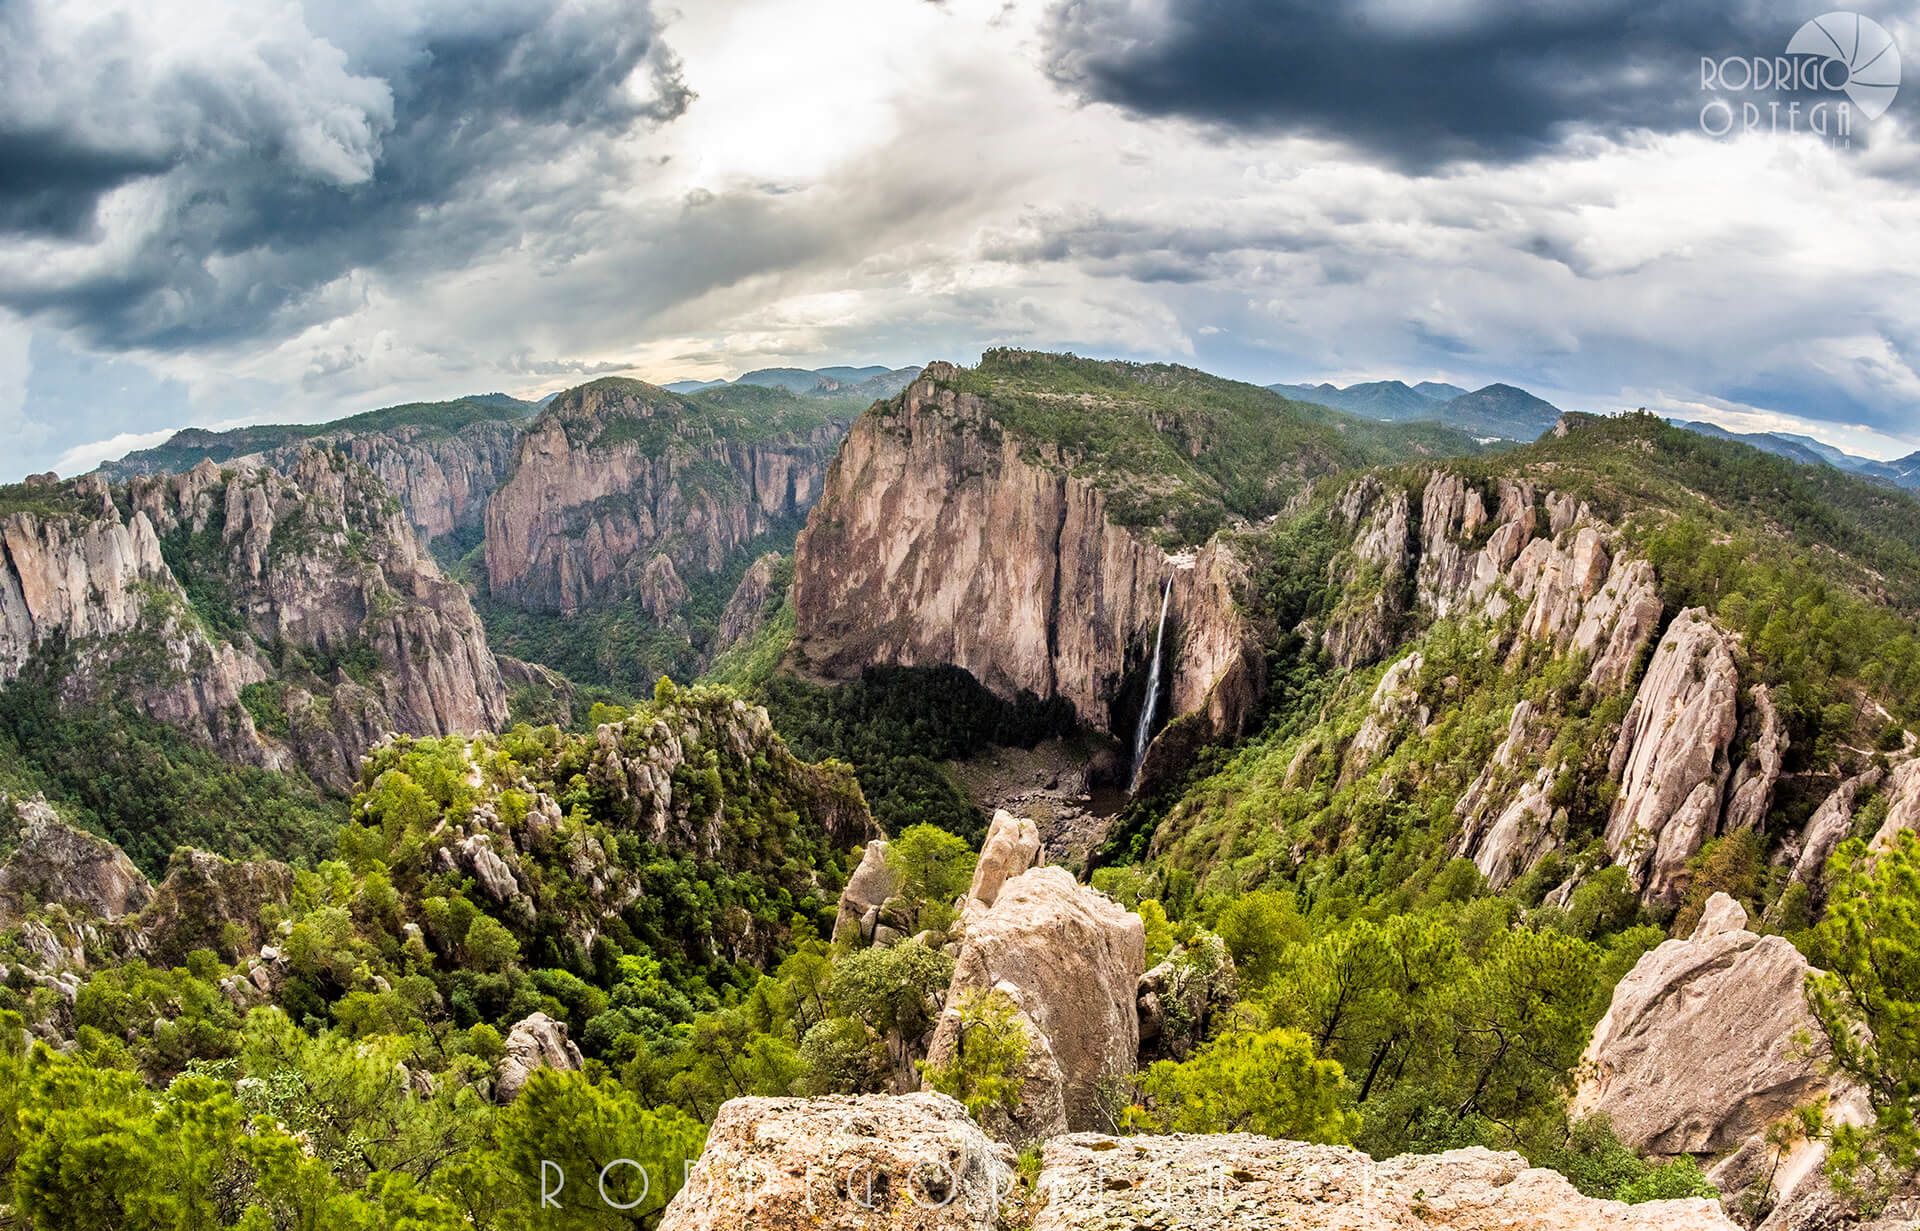 Parque nacional Cascada de Basaseachi, Chihuahua